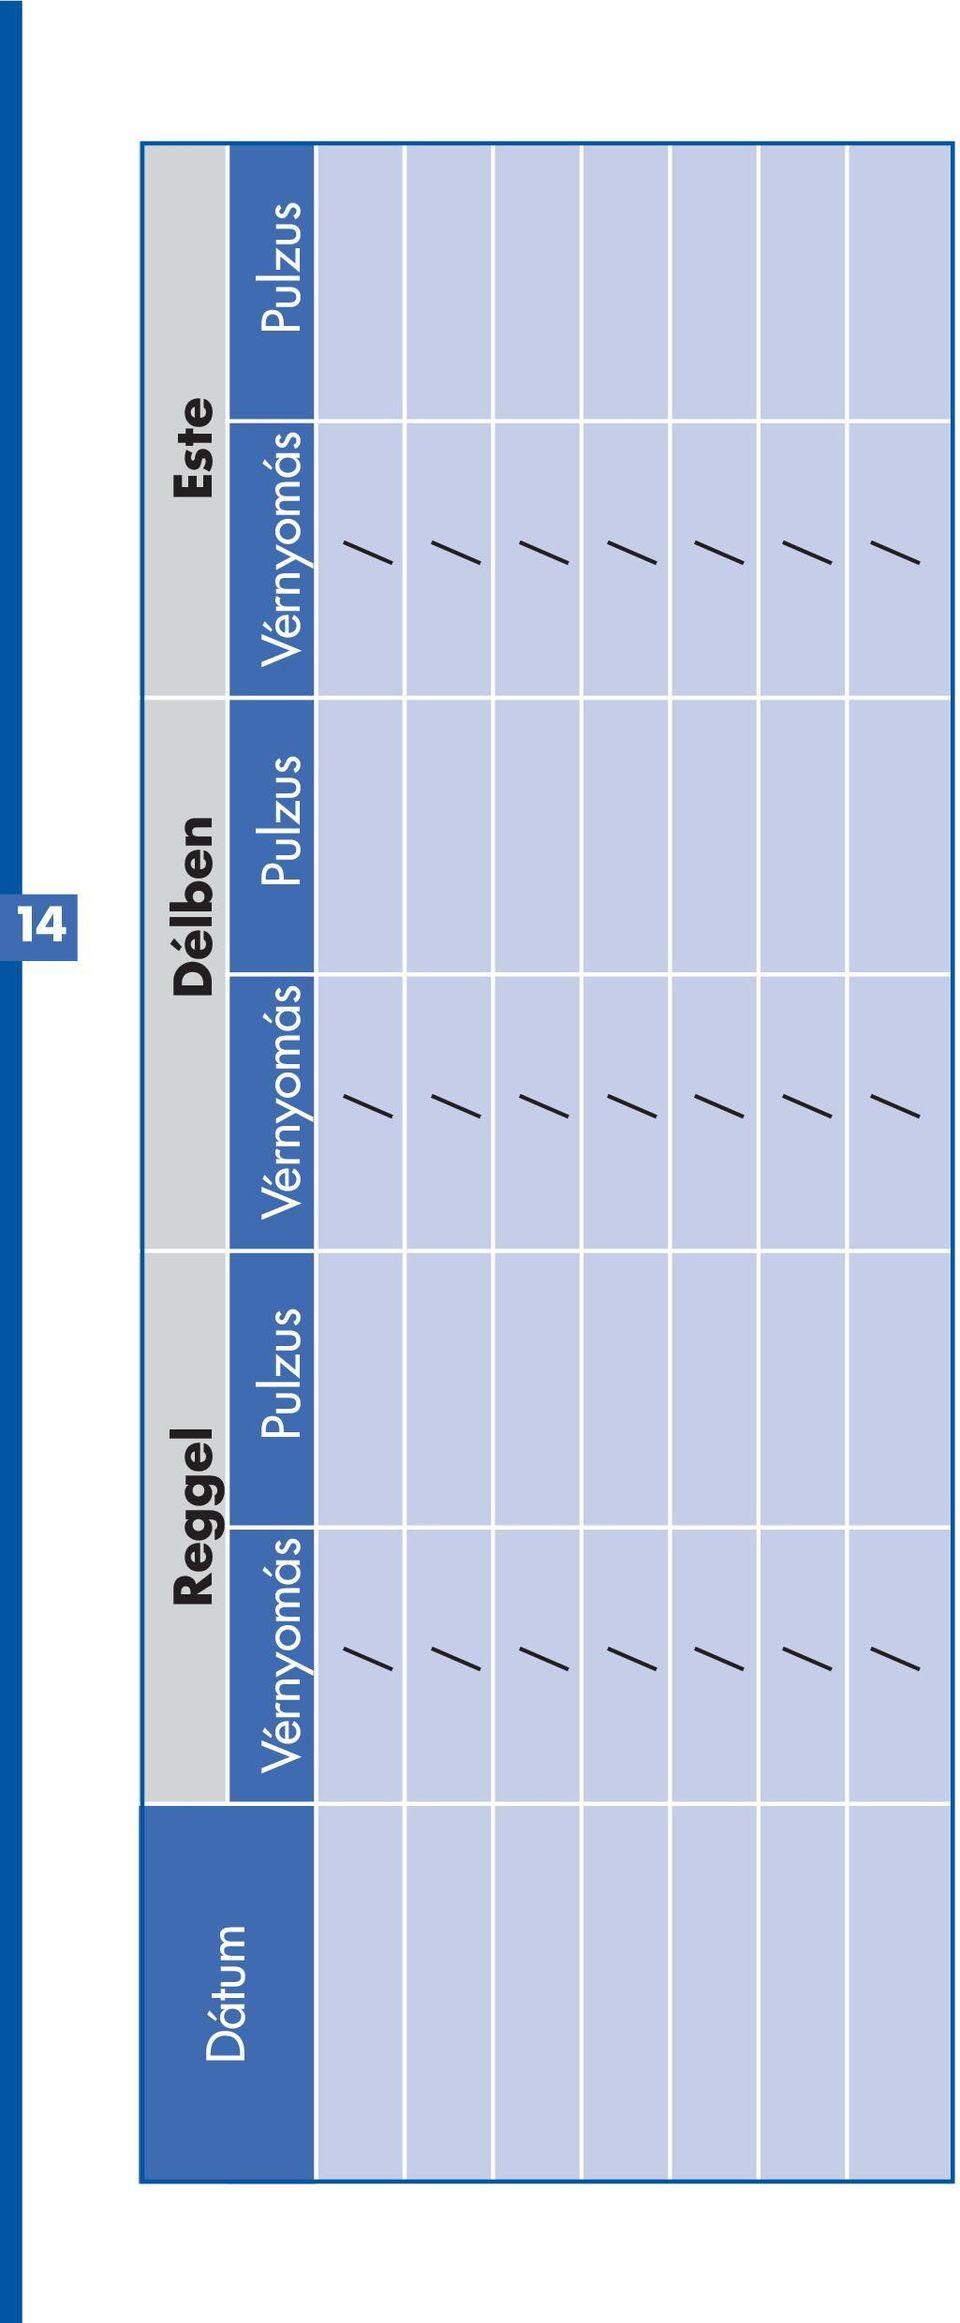 magas vérnyomás napló)